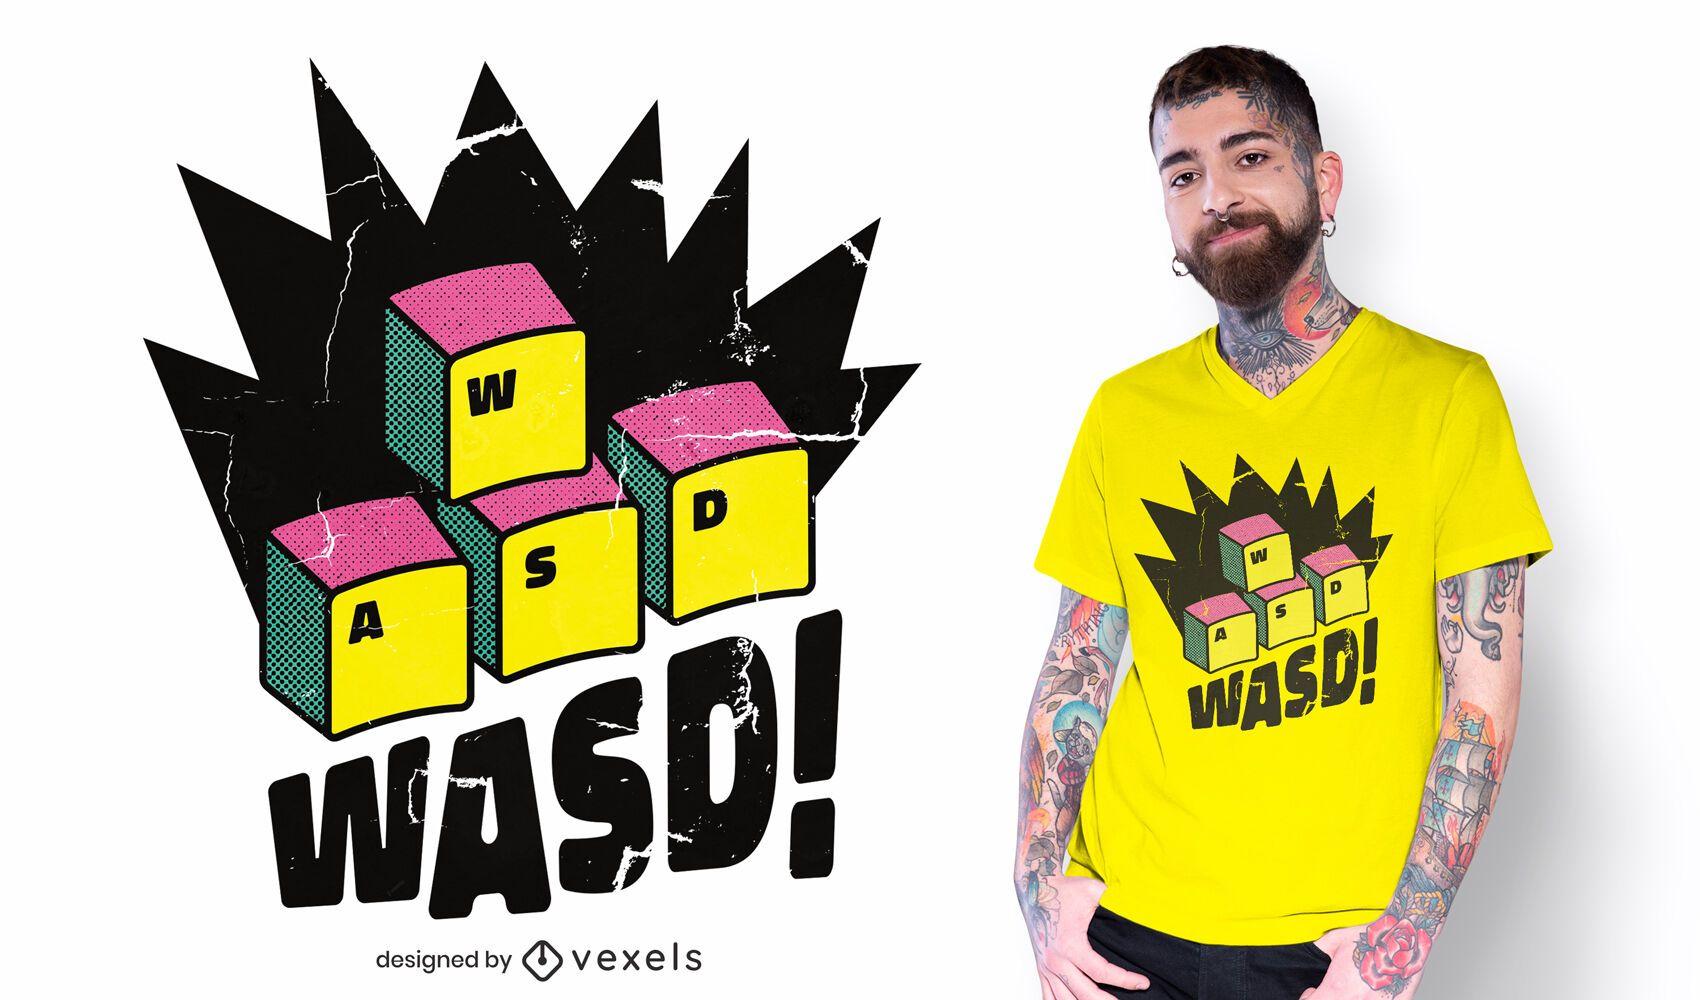 Diseño de camiseta WASD